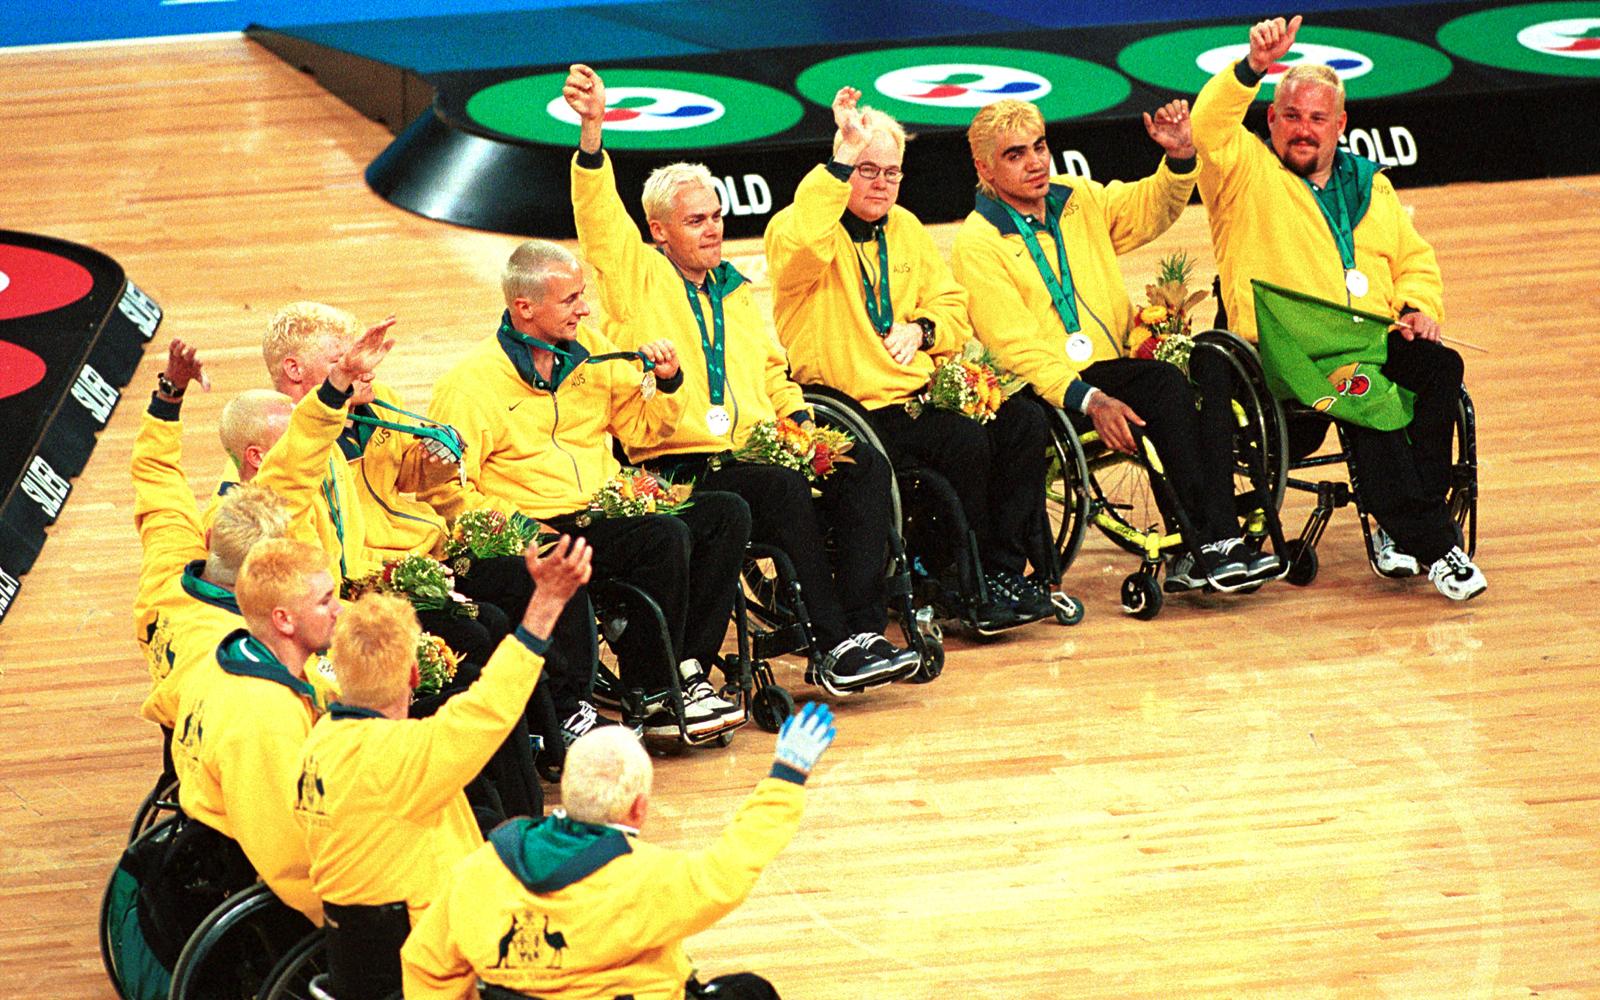 Sydney 2000: Day 11, Thursday 29 October